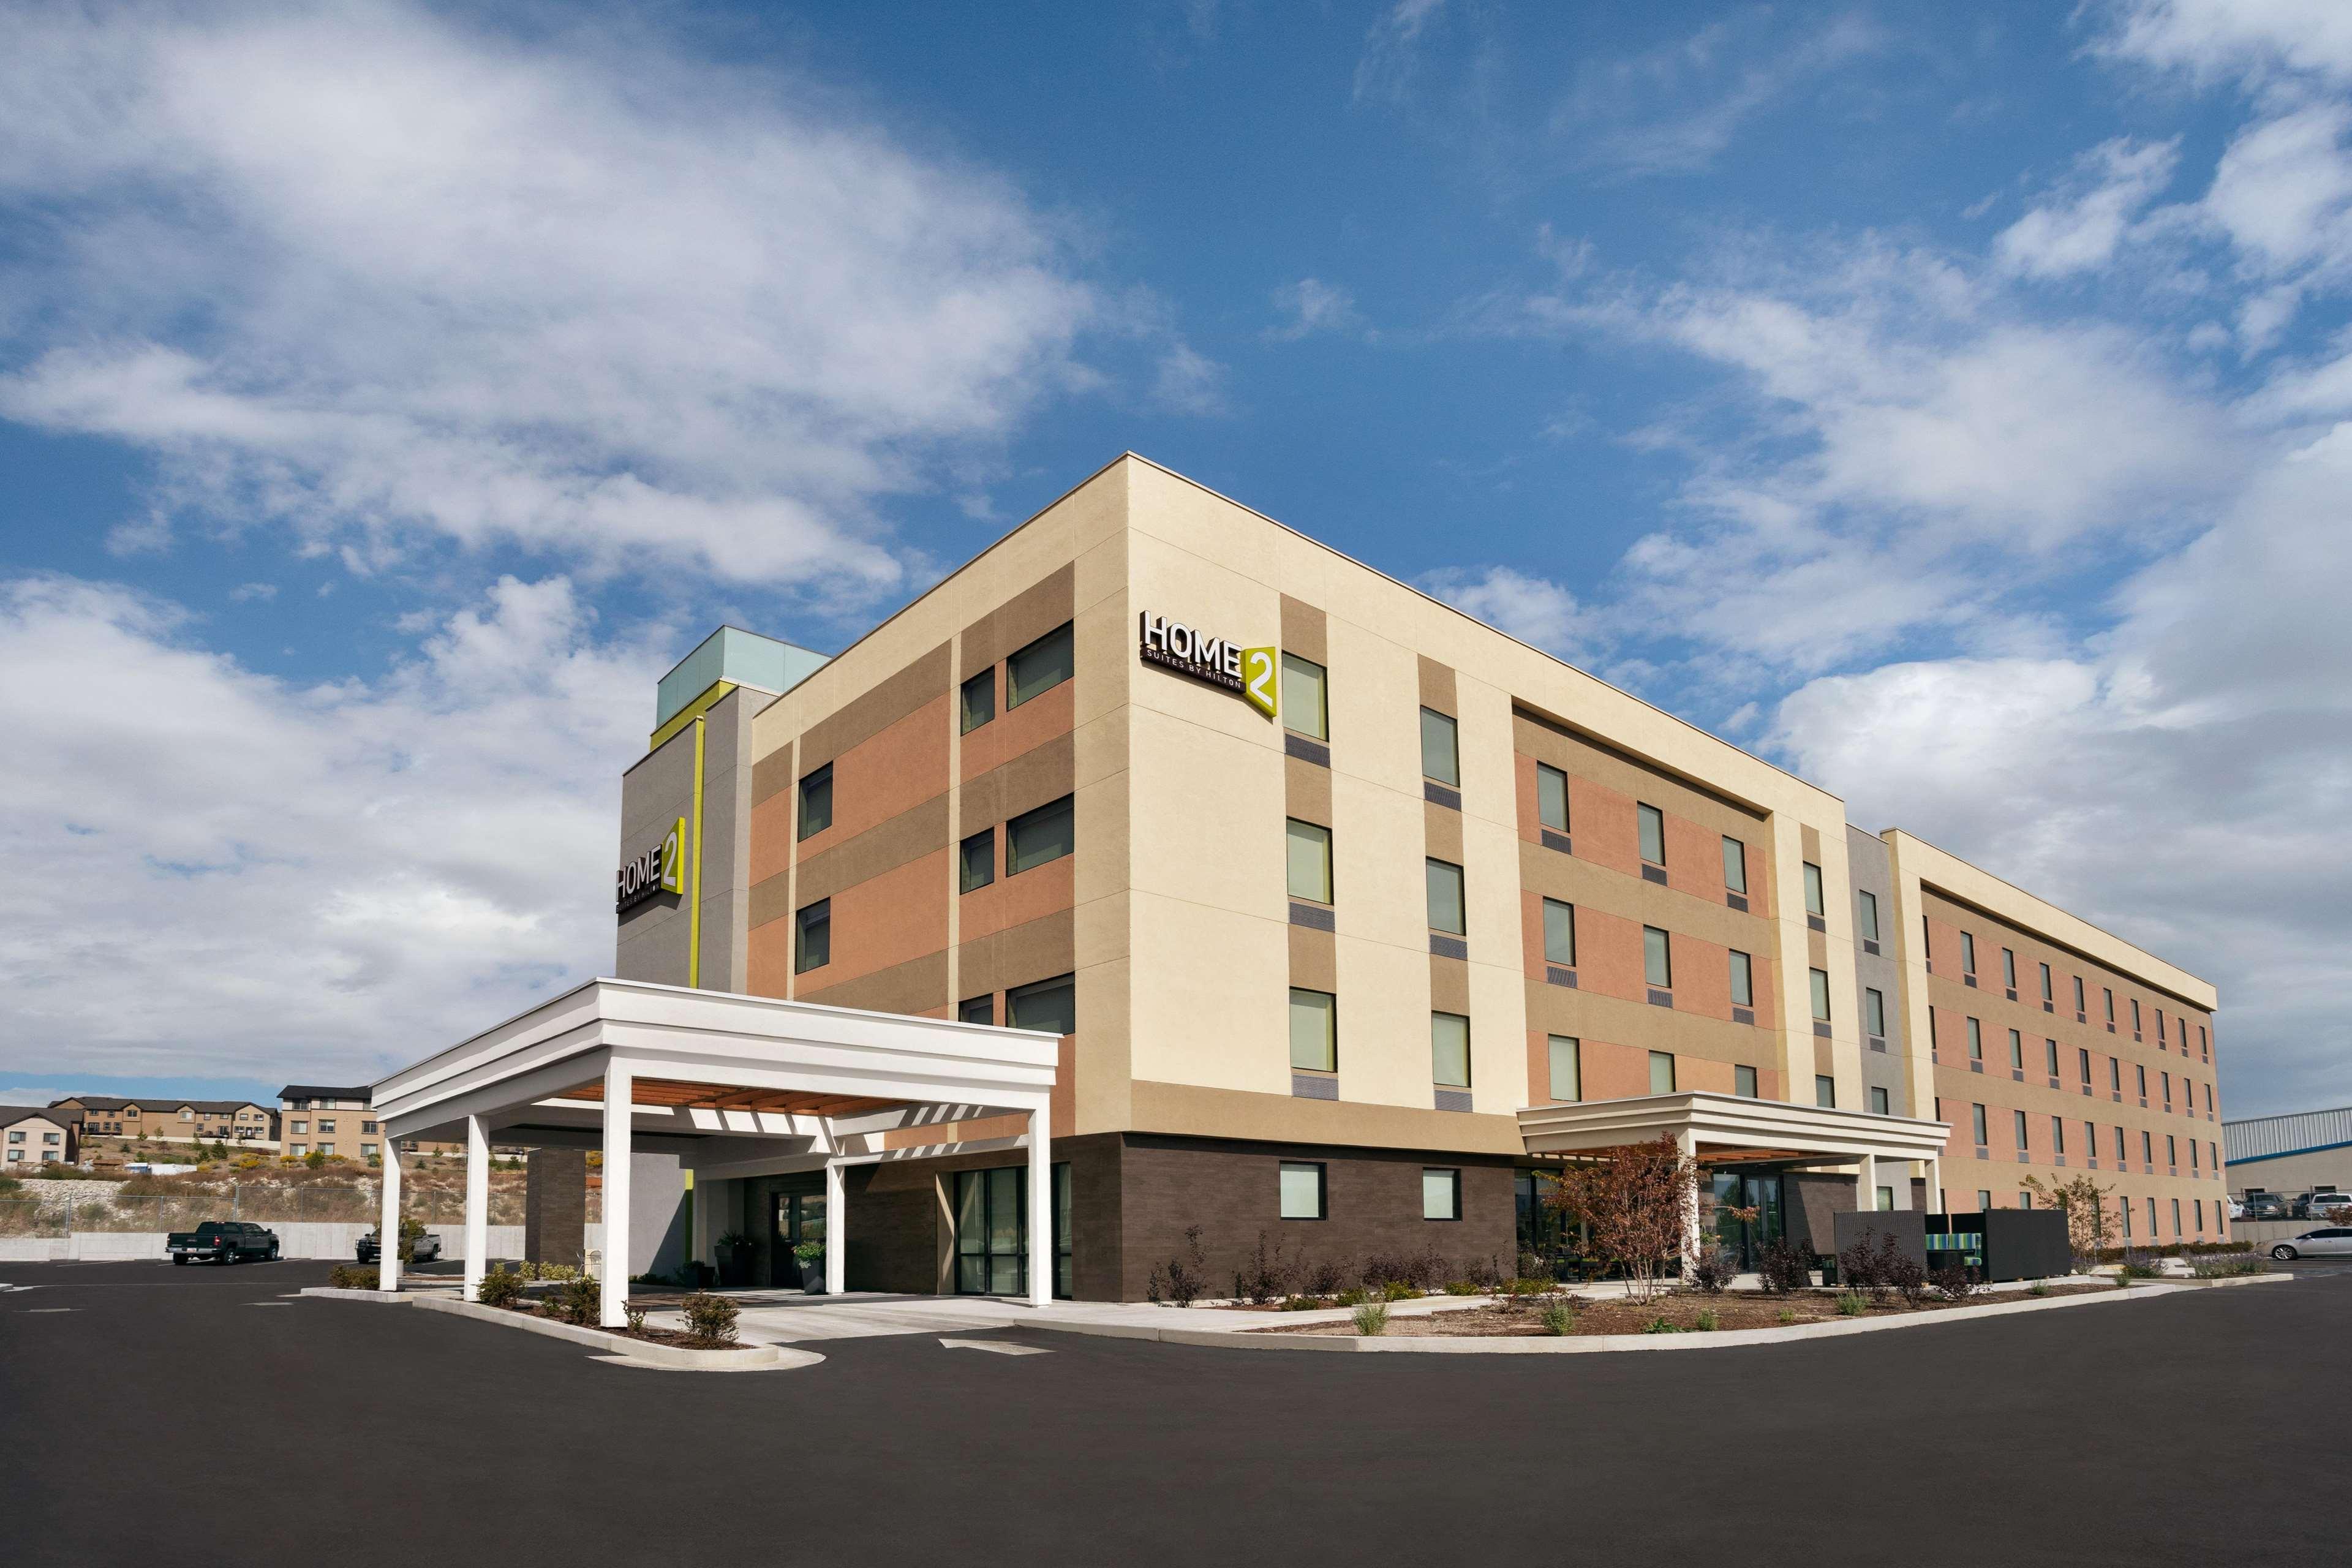 Home2 Suites by Hilton Elko image 0